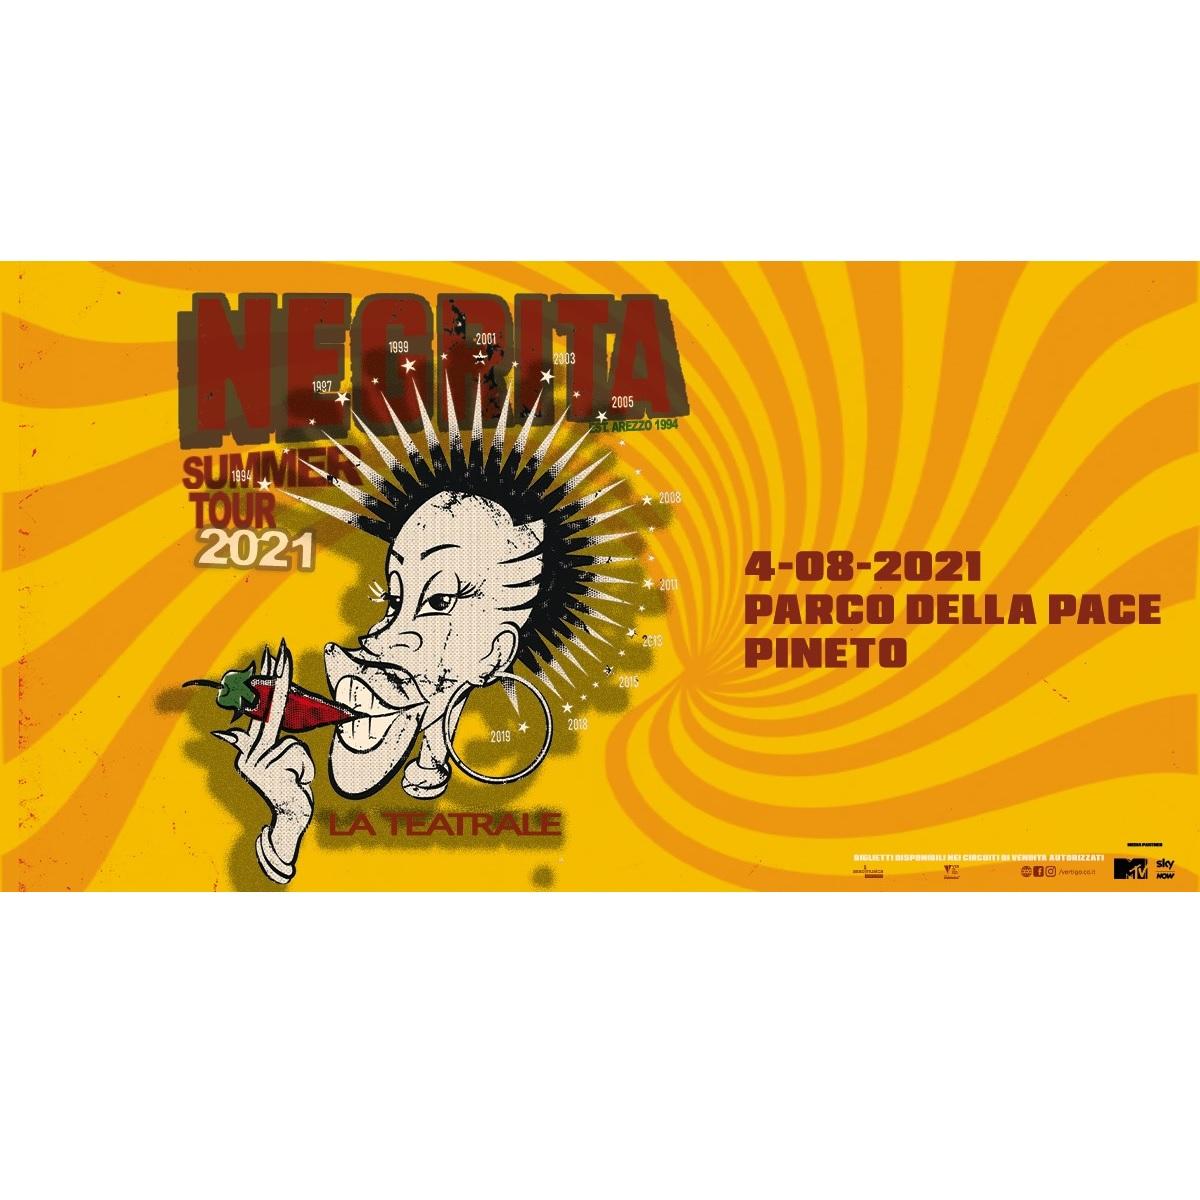 Negrita - La Teatrale Summer Tour 2021 a Pineto foto